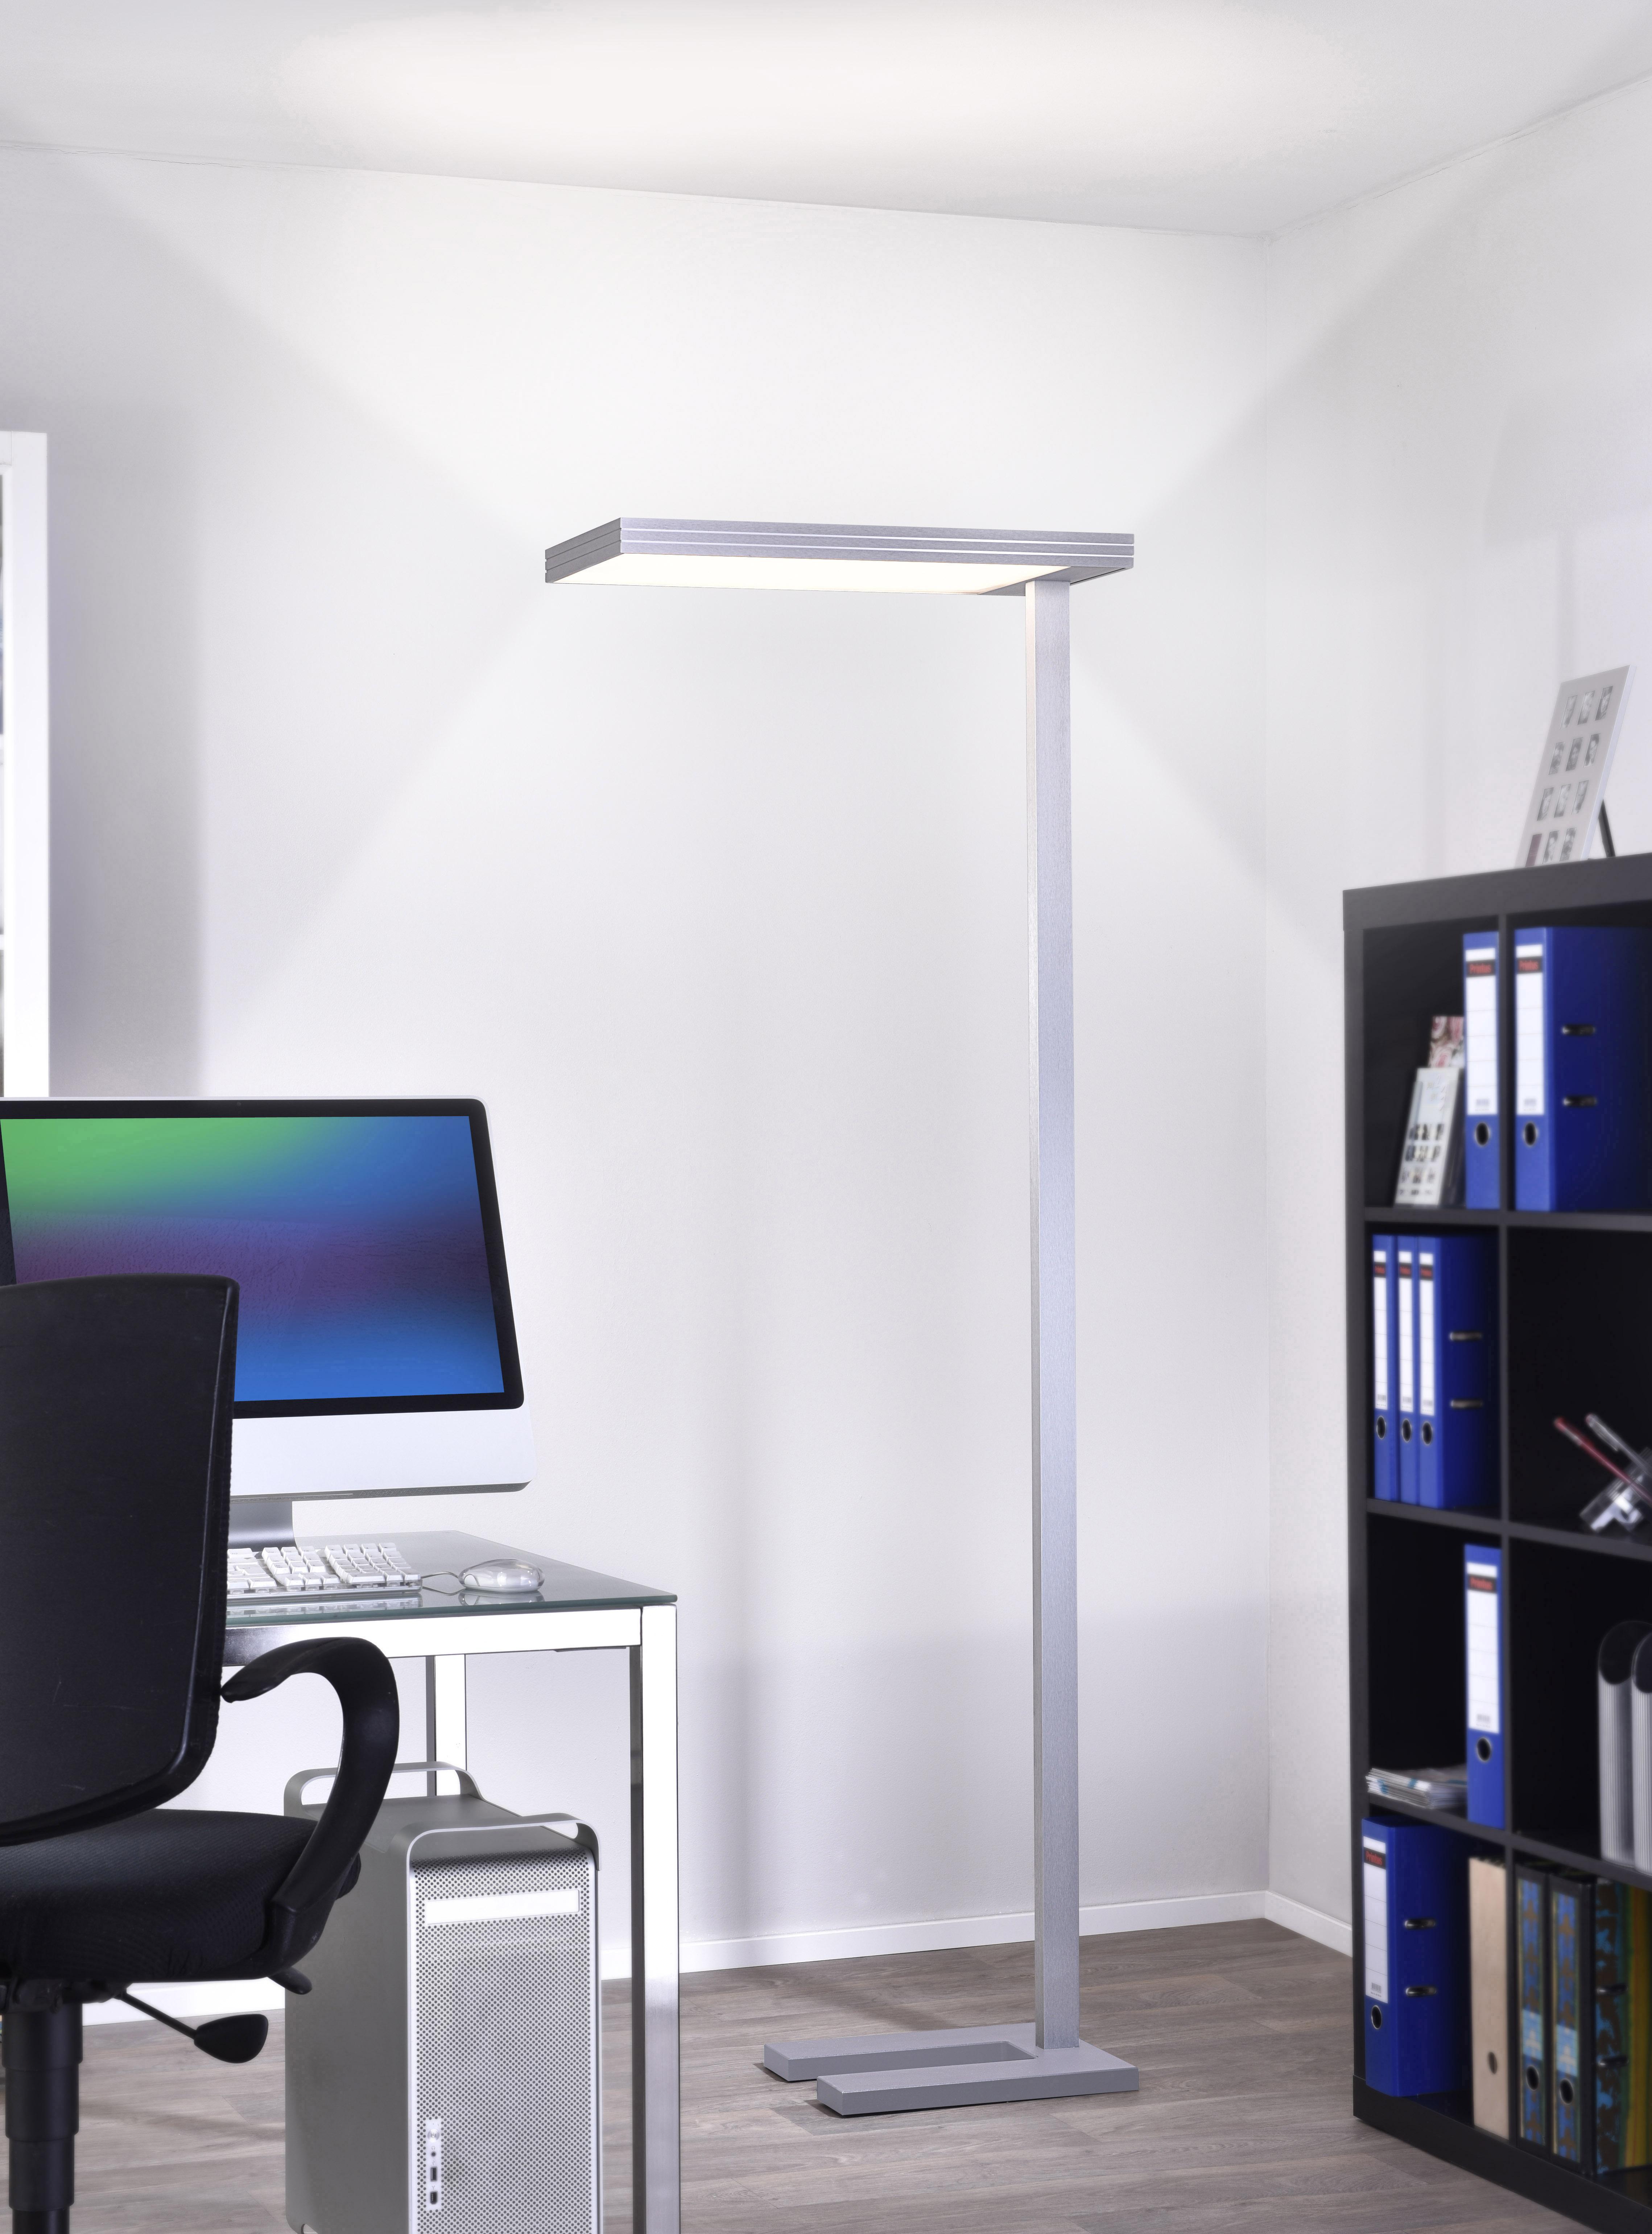 Paul Neuhaus, Q-PAUL, LED-Stehleuchte, aluminium, Smart Home (Auslauf)